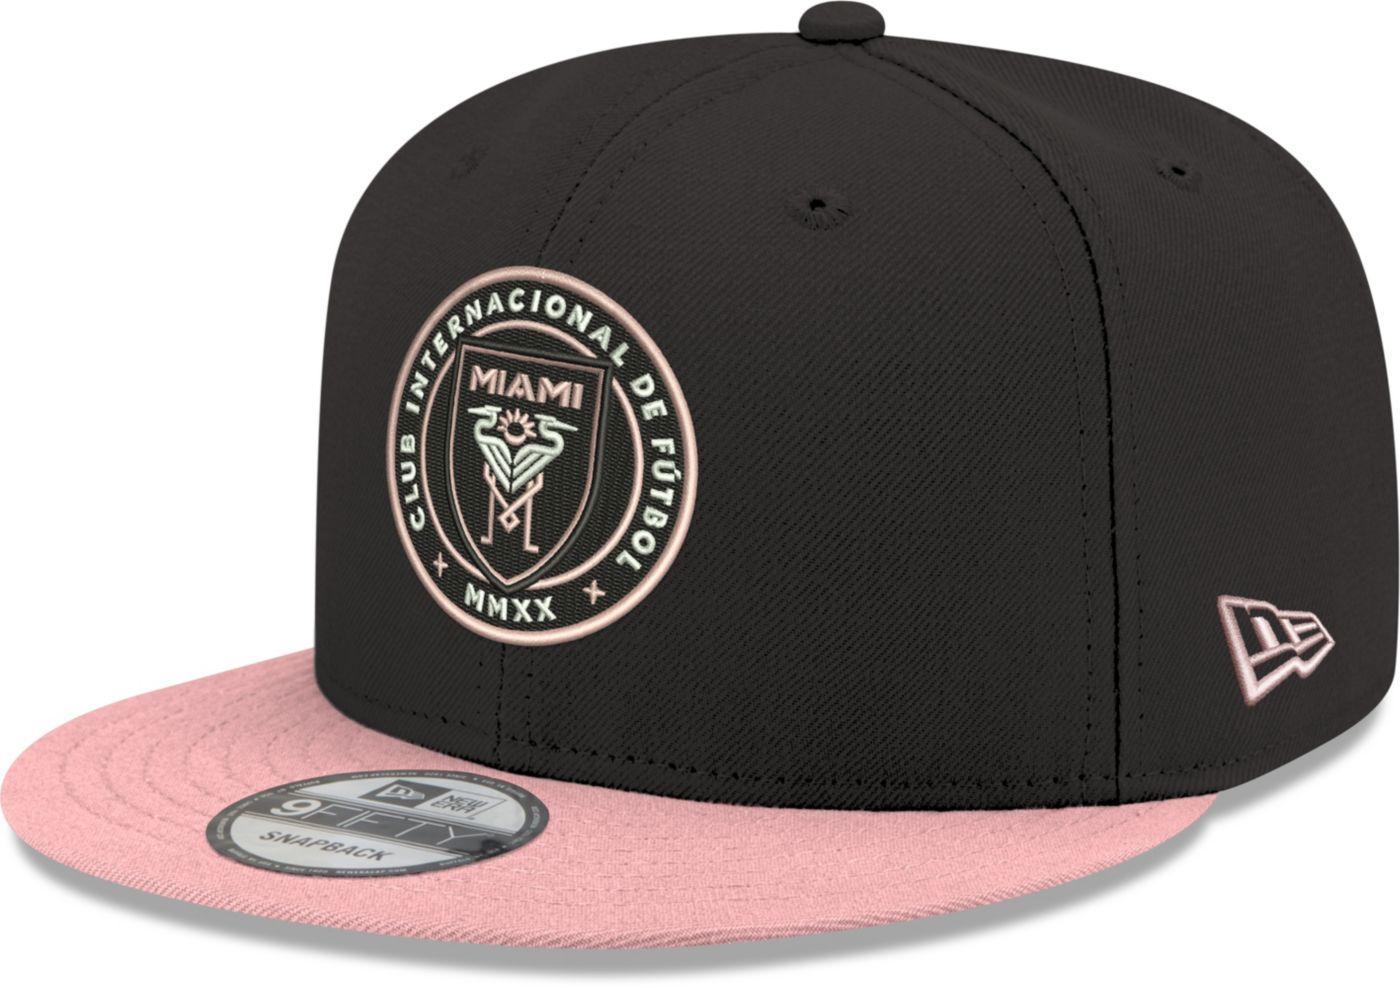 New Era Men's Inter Miami CF 9Fifty Adjustable Snapback Hat